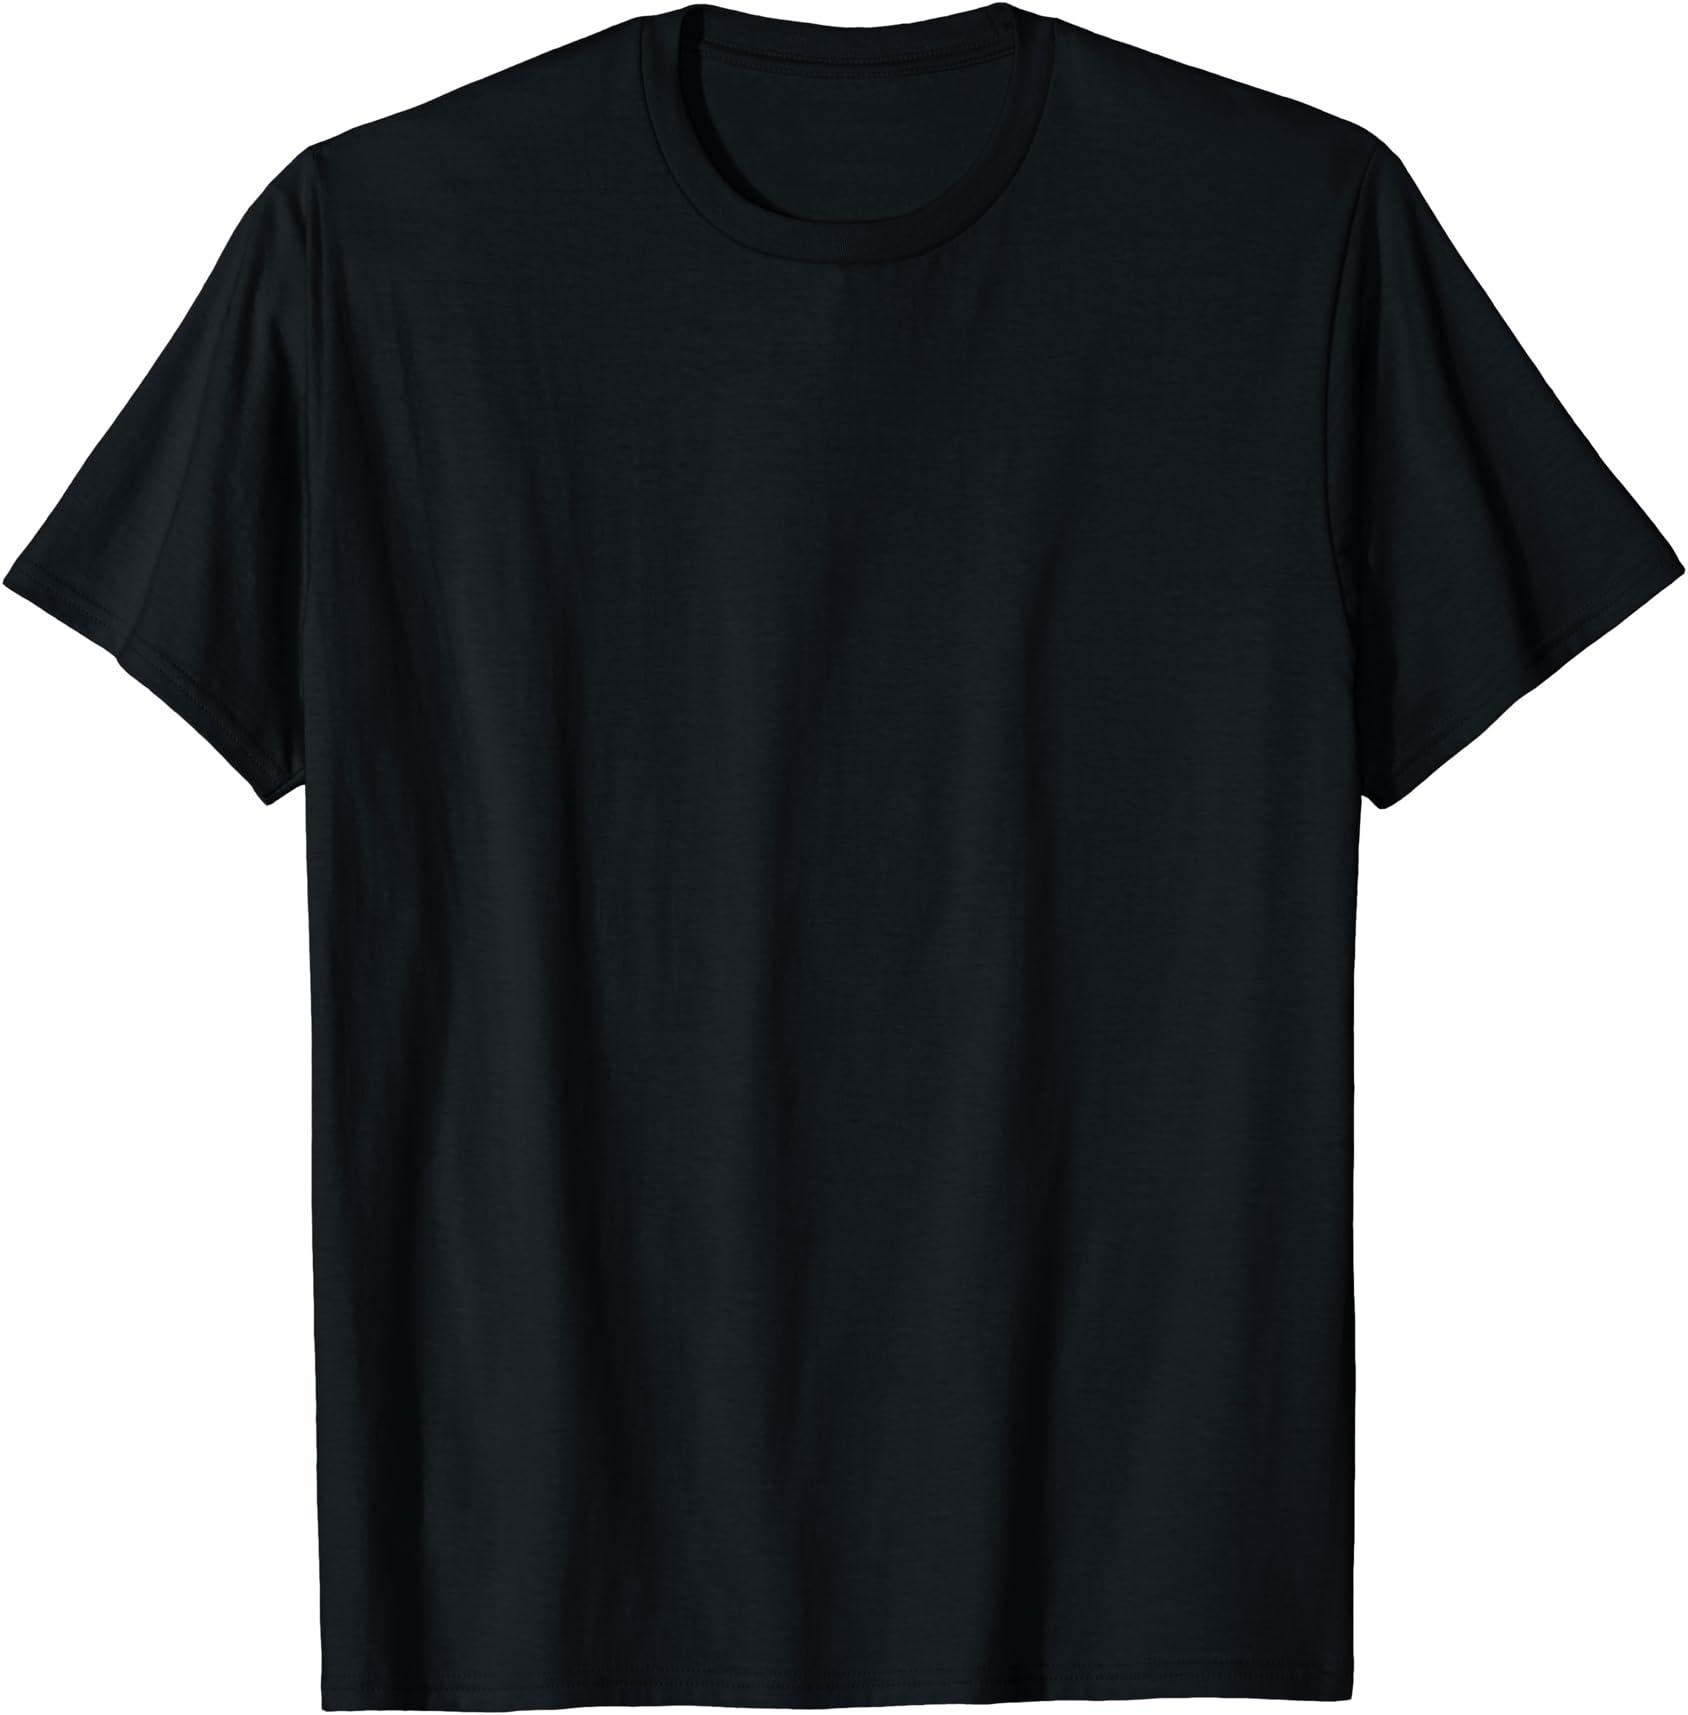 NO EXCUSES Black Shirt Gym Bodybuilding T-shirt for Bodybuilding Fitness